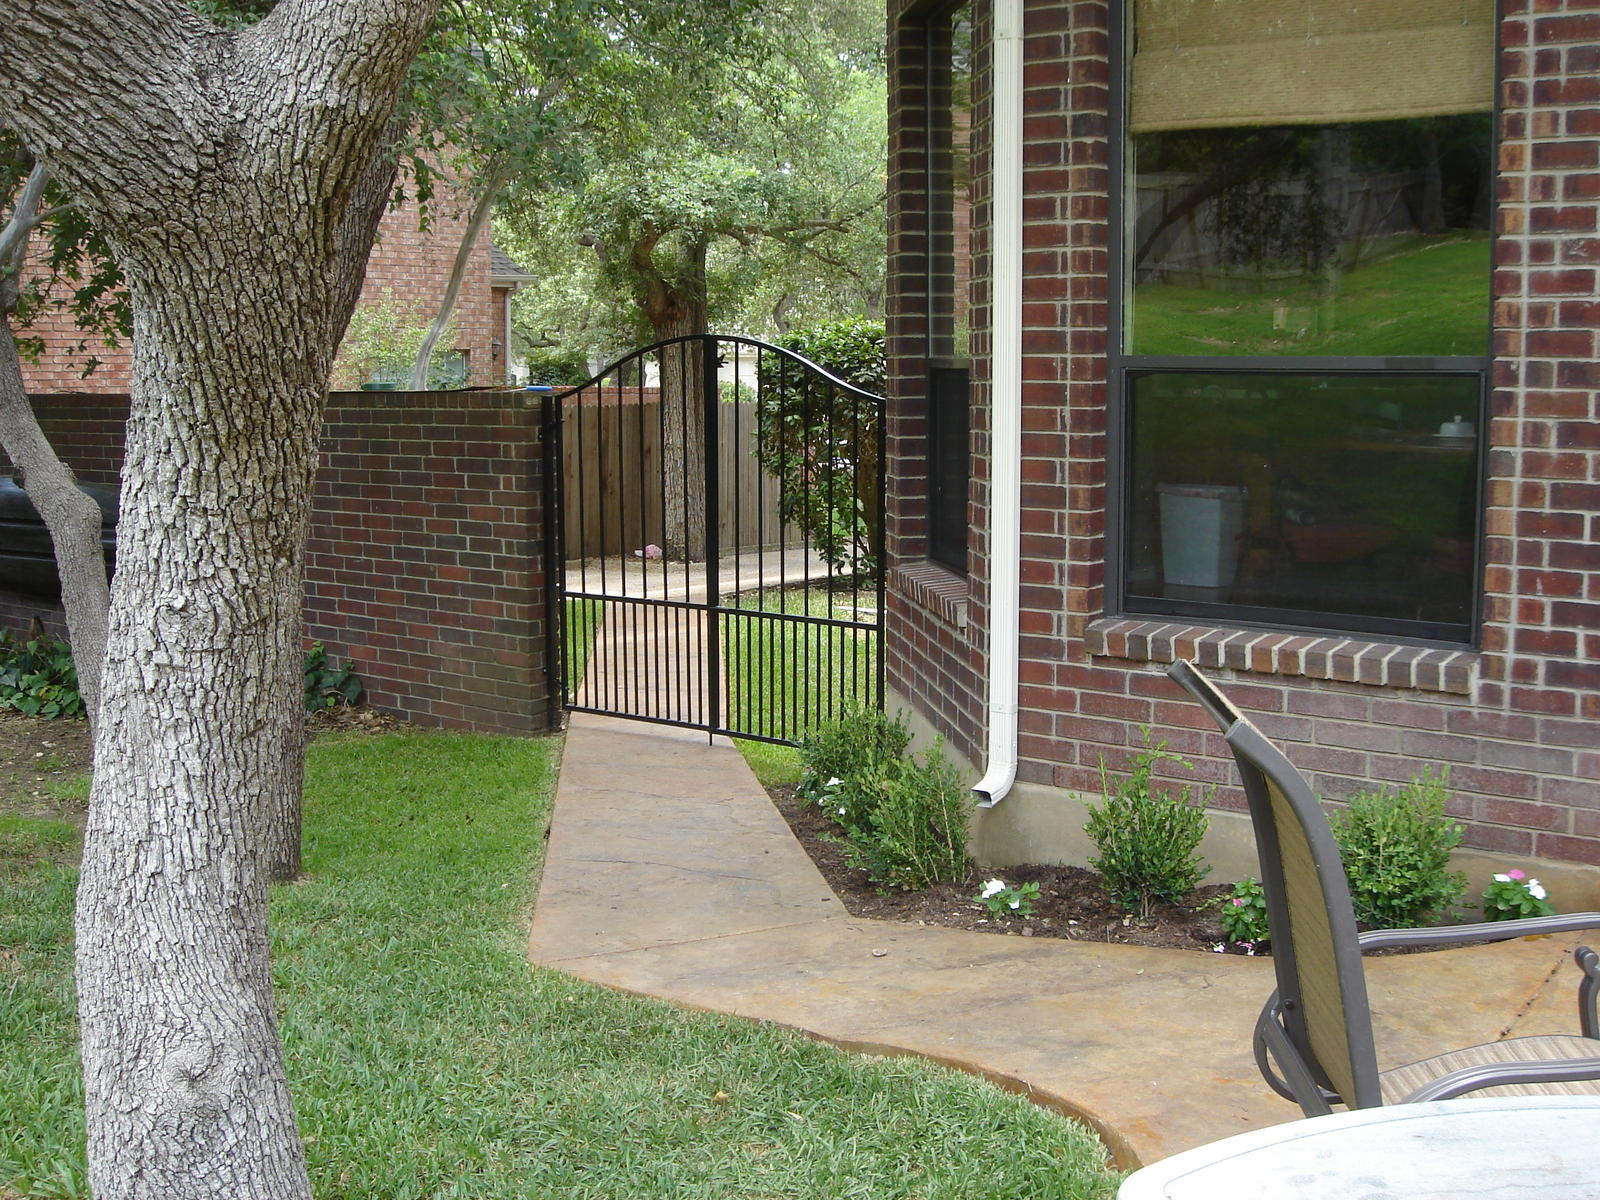 Concrete Patio Recs Please San Antonio Texas TX